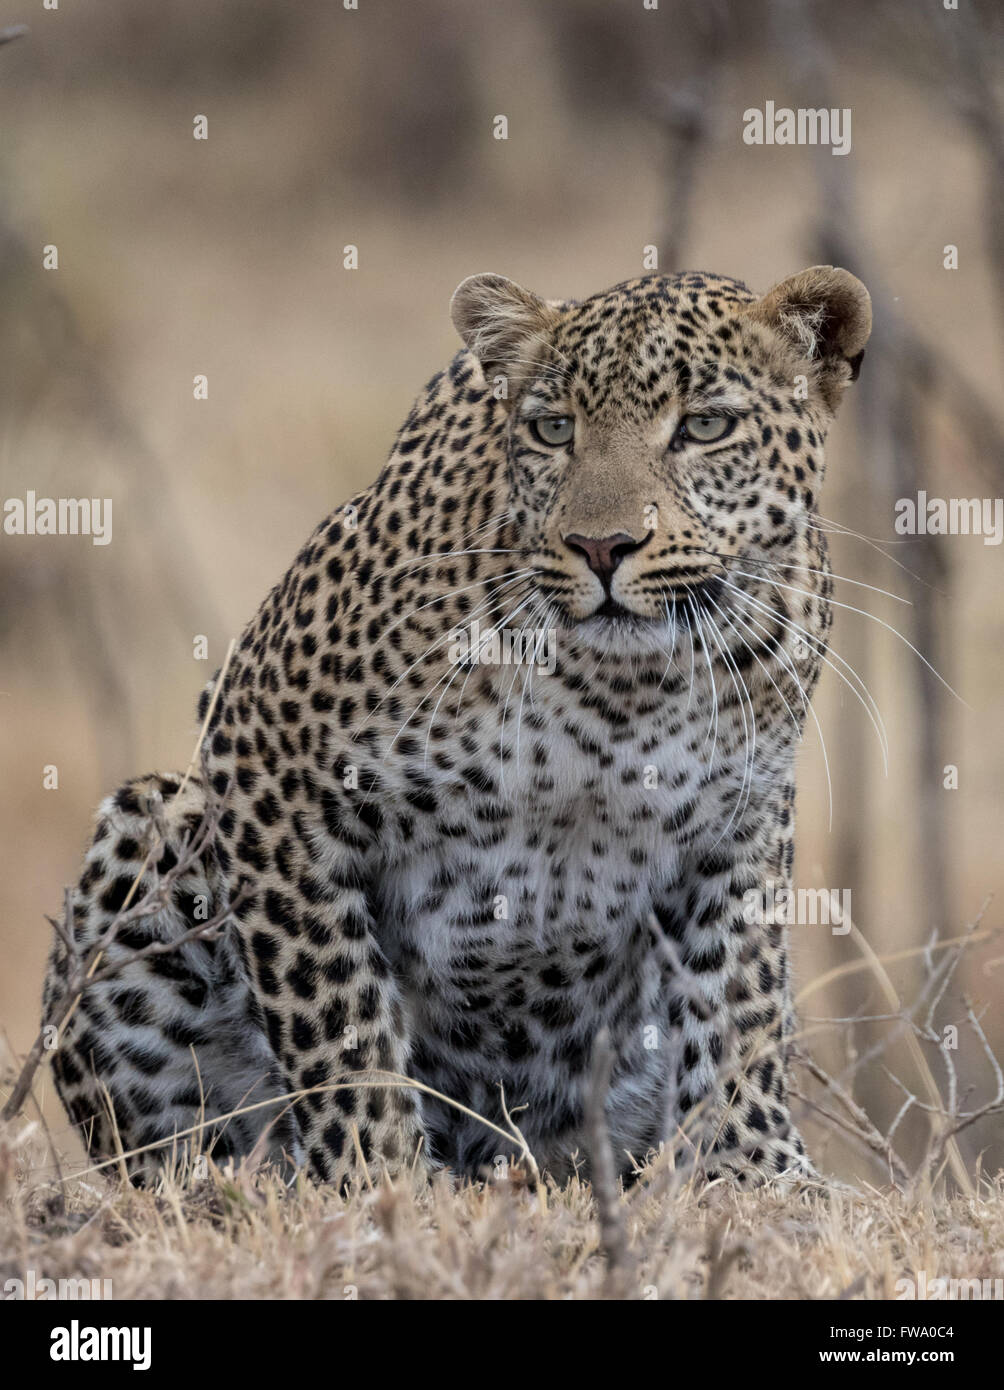 Leopard (Panthera Pardus) crouched ready to pounce taken in Masai Mara Kenya. - Stock Image